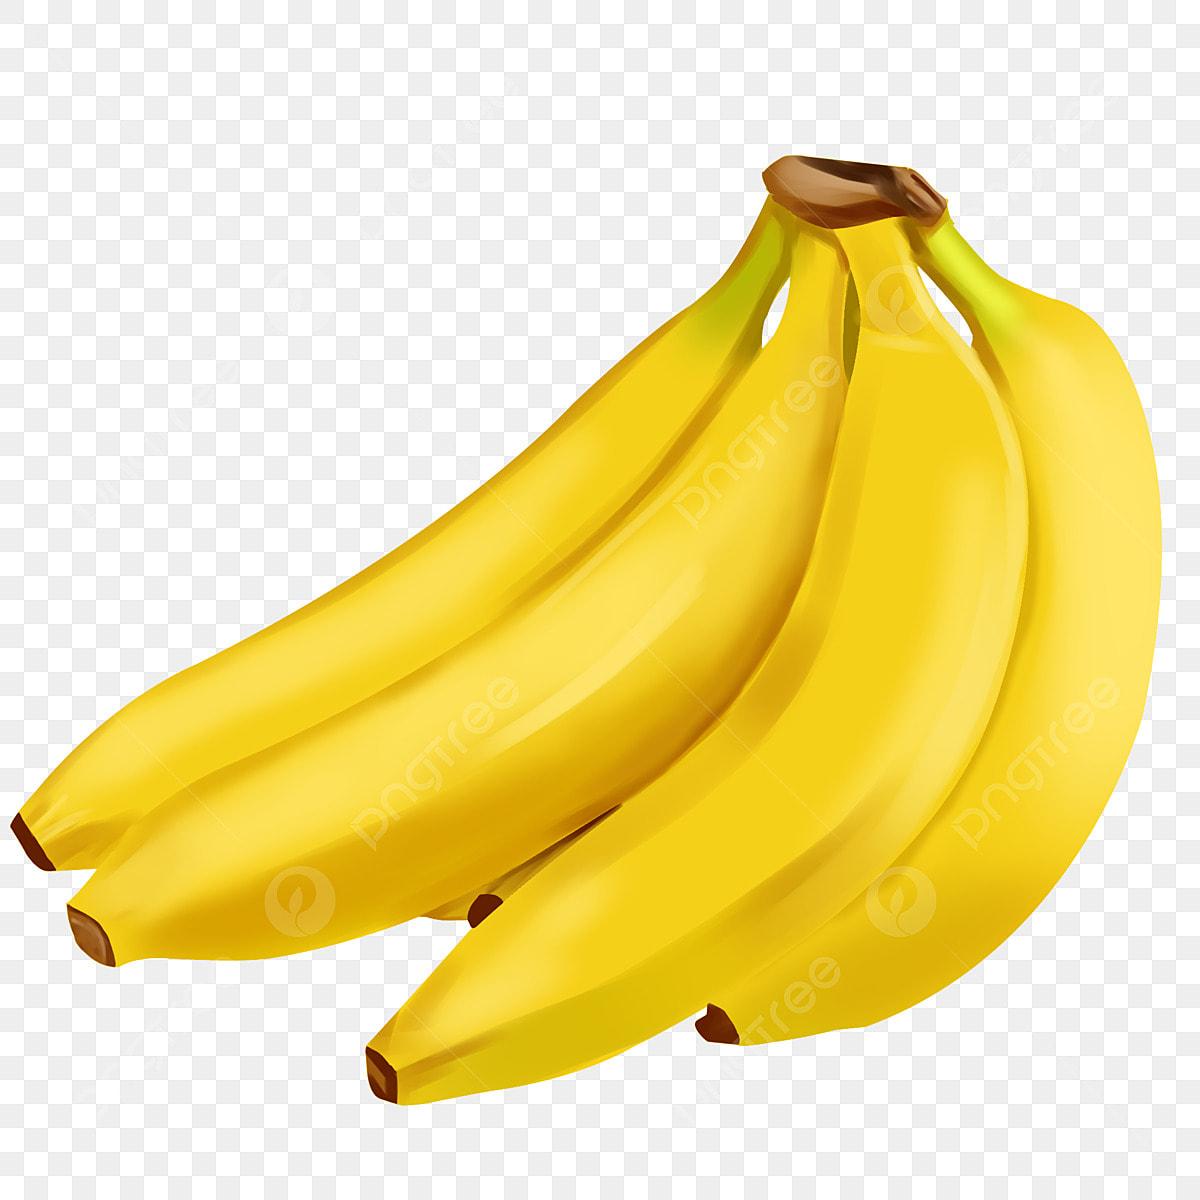 Banana Clipart Images, Stock Photos & Vectors | Shutterstock